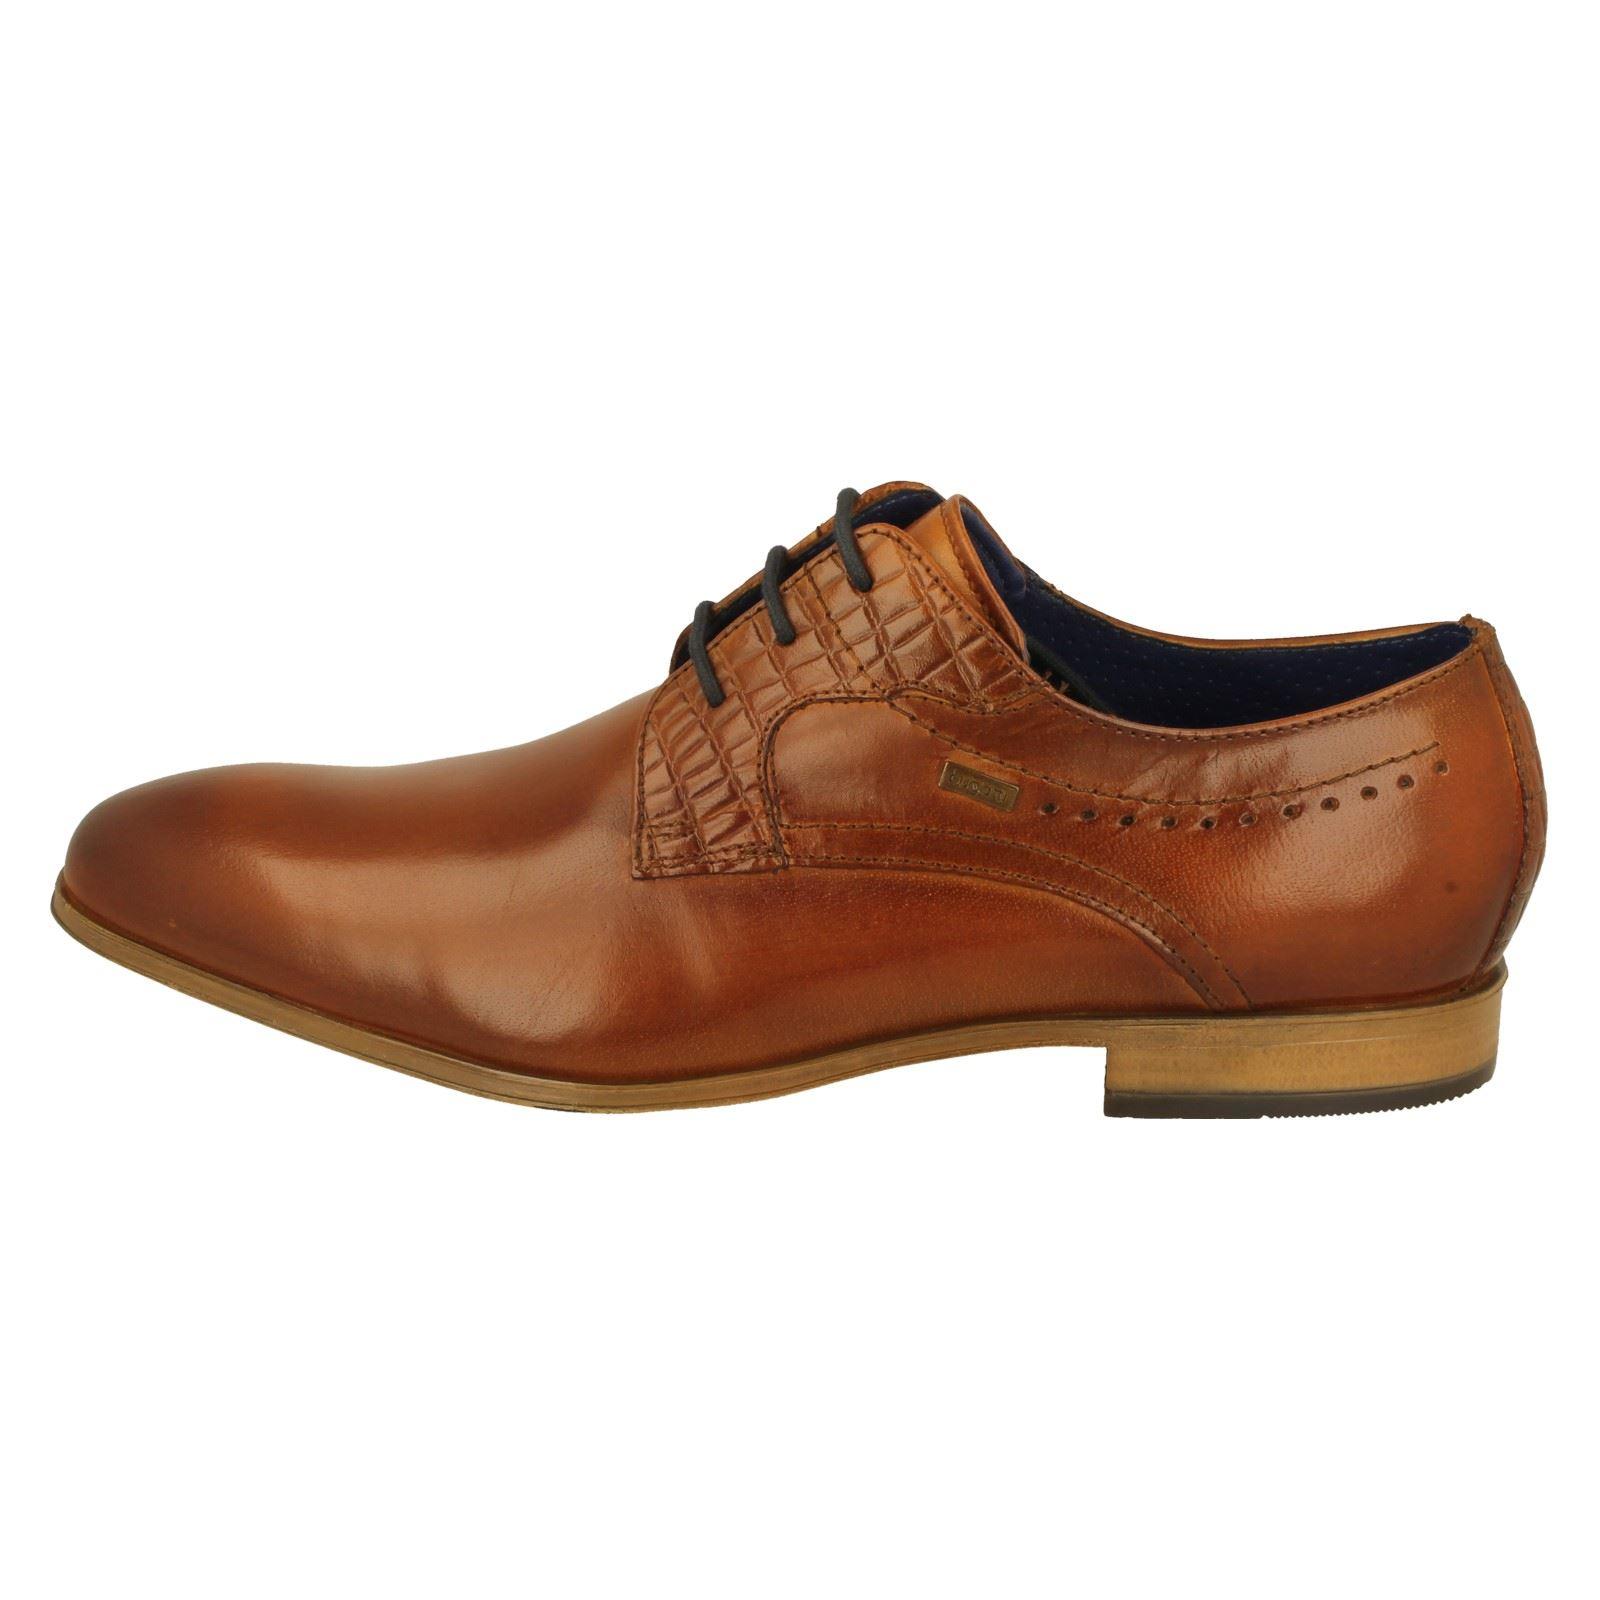 Cognac Bugatti Style Shoes Mens 311 2100 w 25202 0wfcEdxq